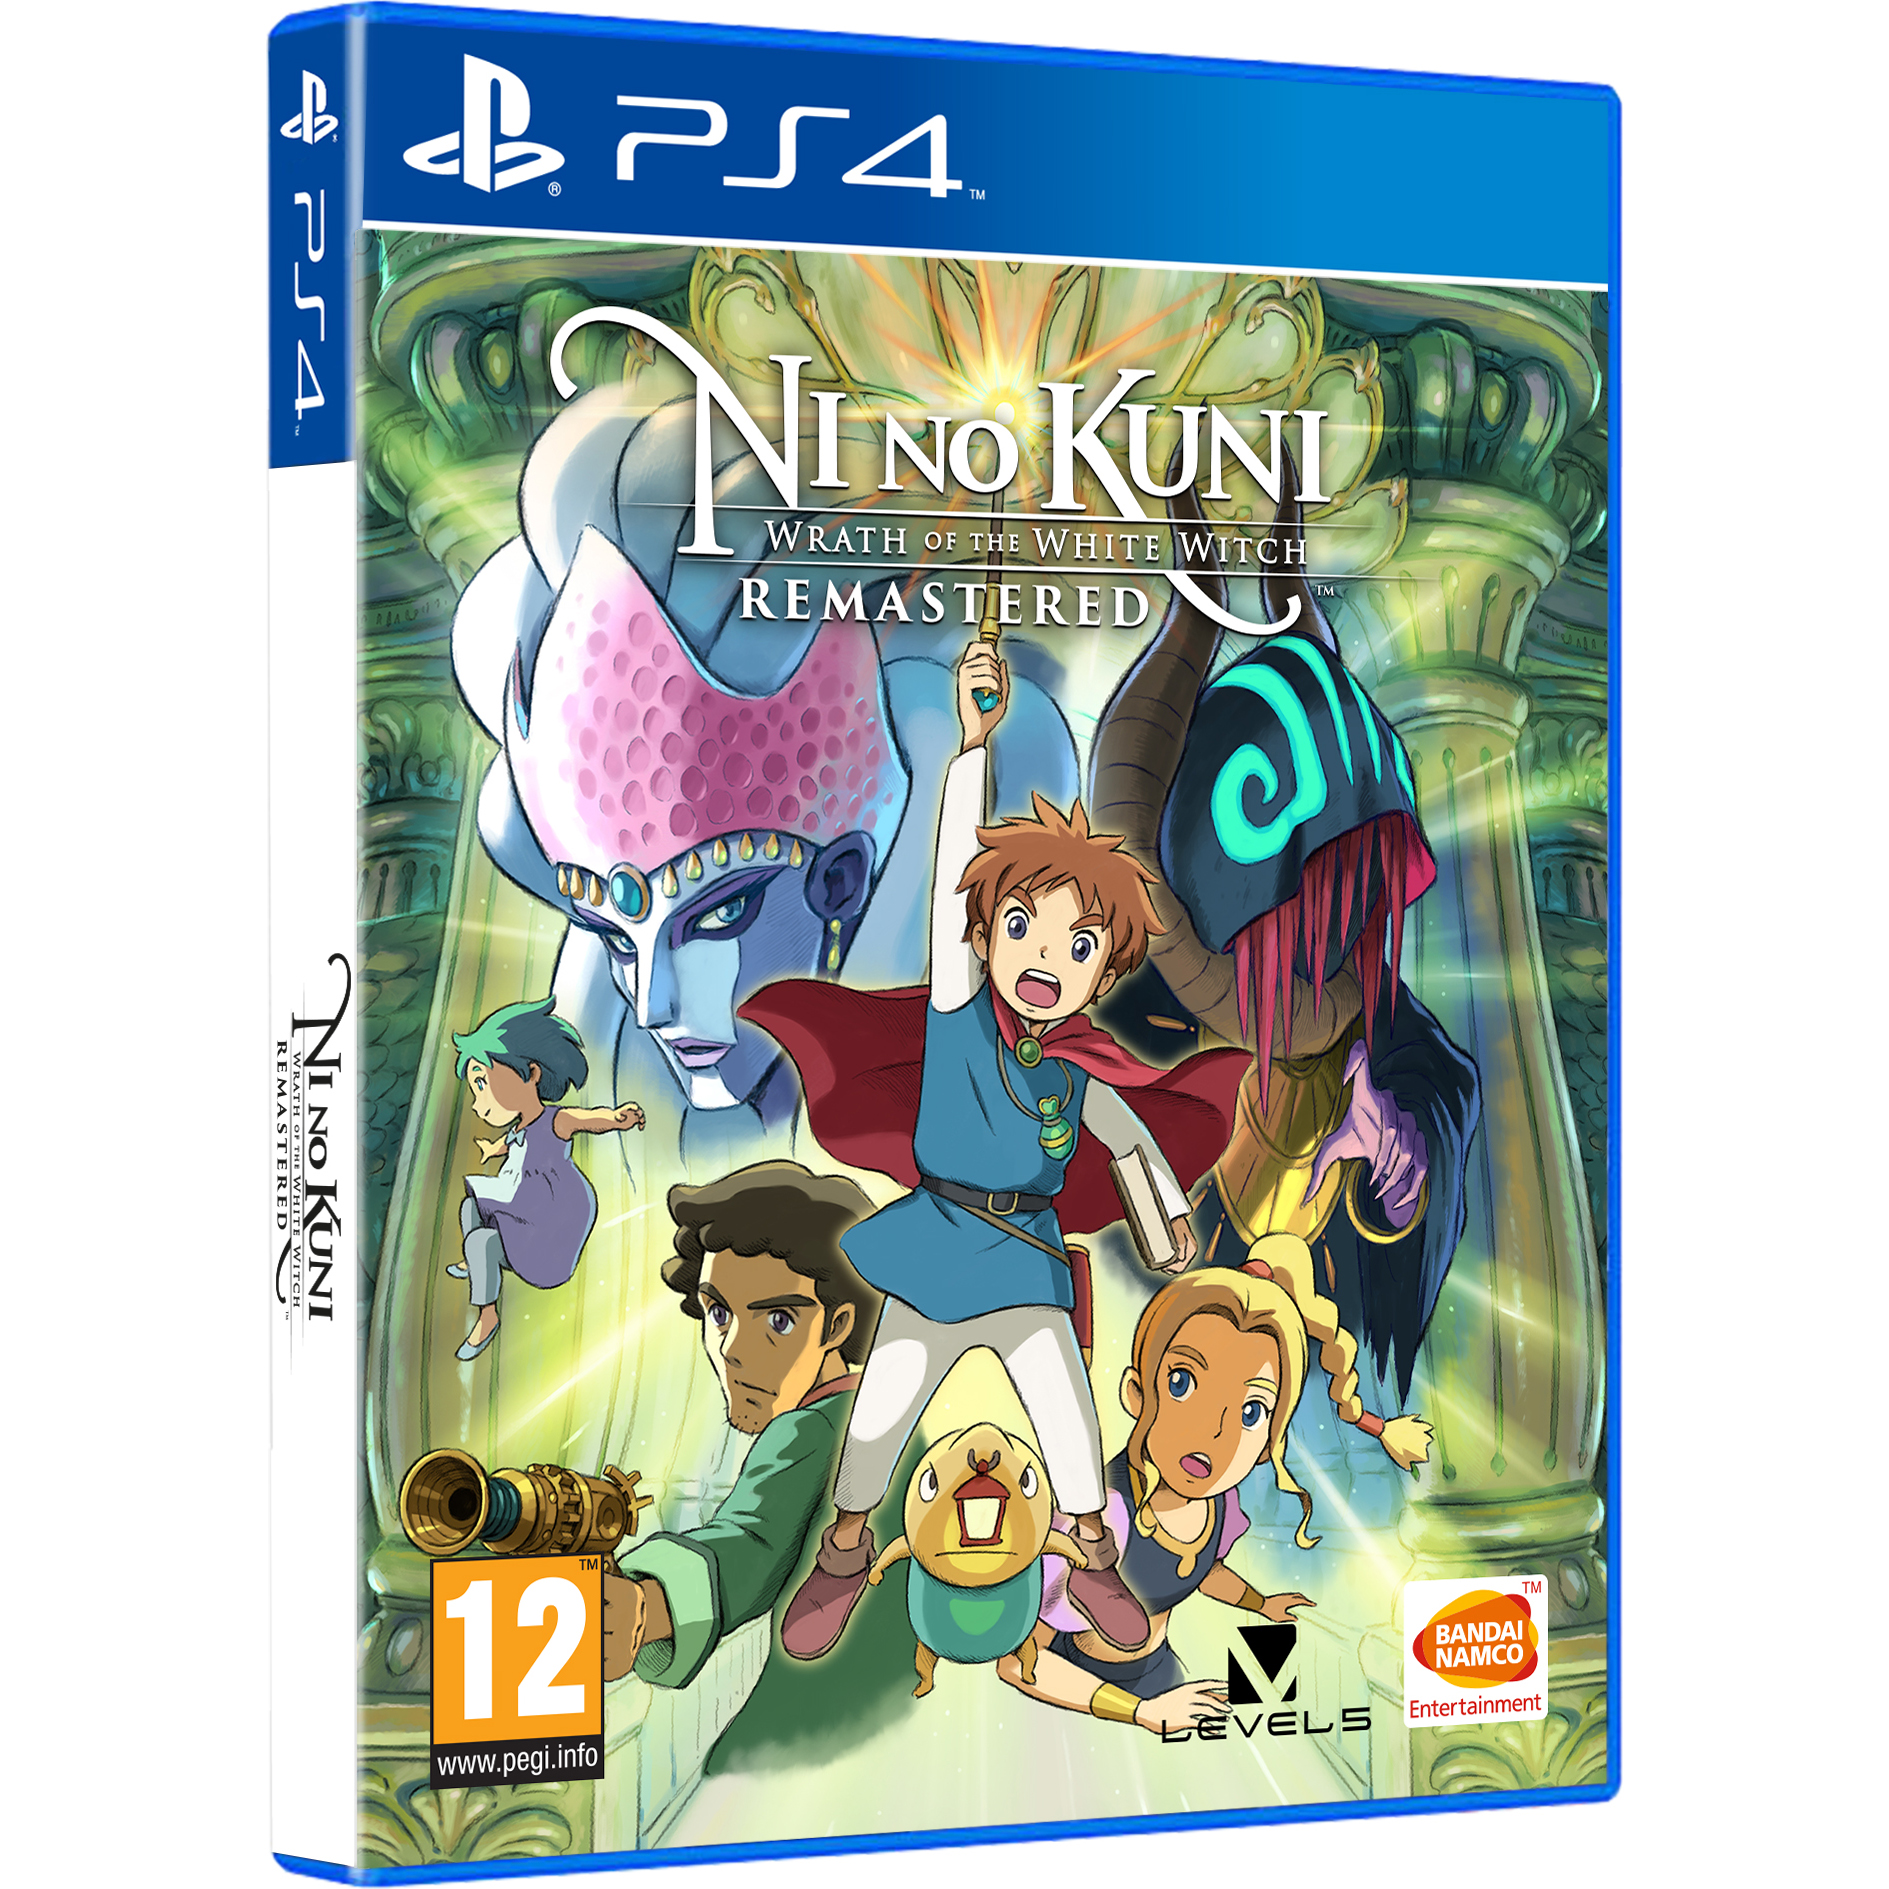 Joc NI NO KUNI: WRATH OF THE WHITE WITCH REMASTERED pentru PlayStation 4 0